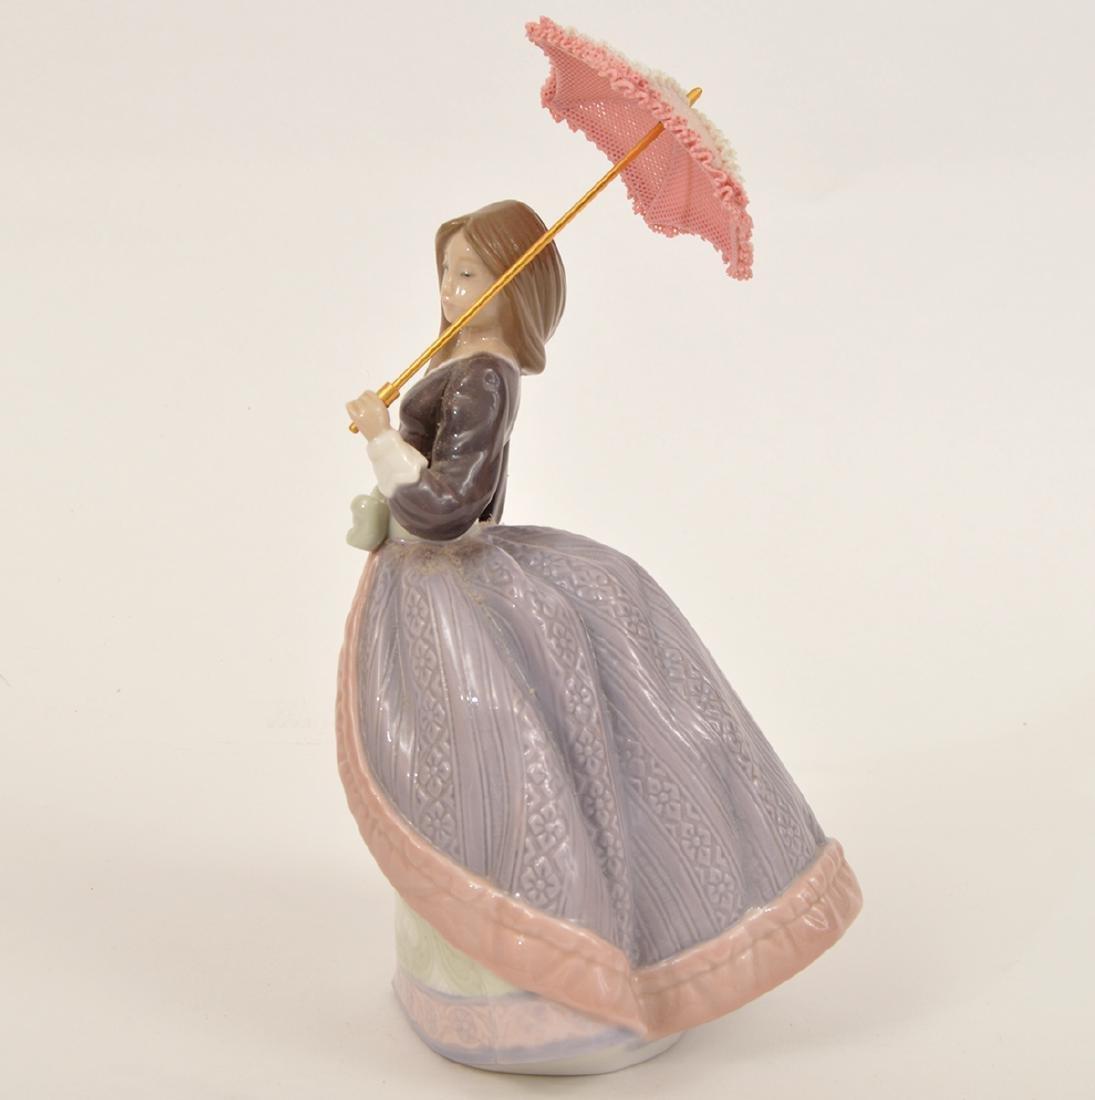 Lladro Angela with Parasol Porcelain Figurine 5211 - 2